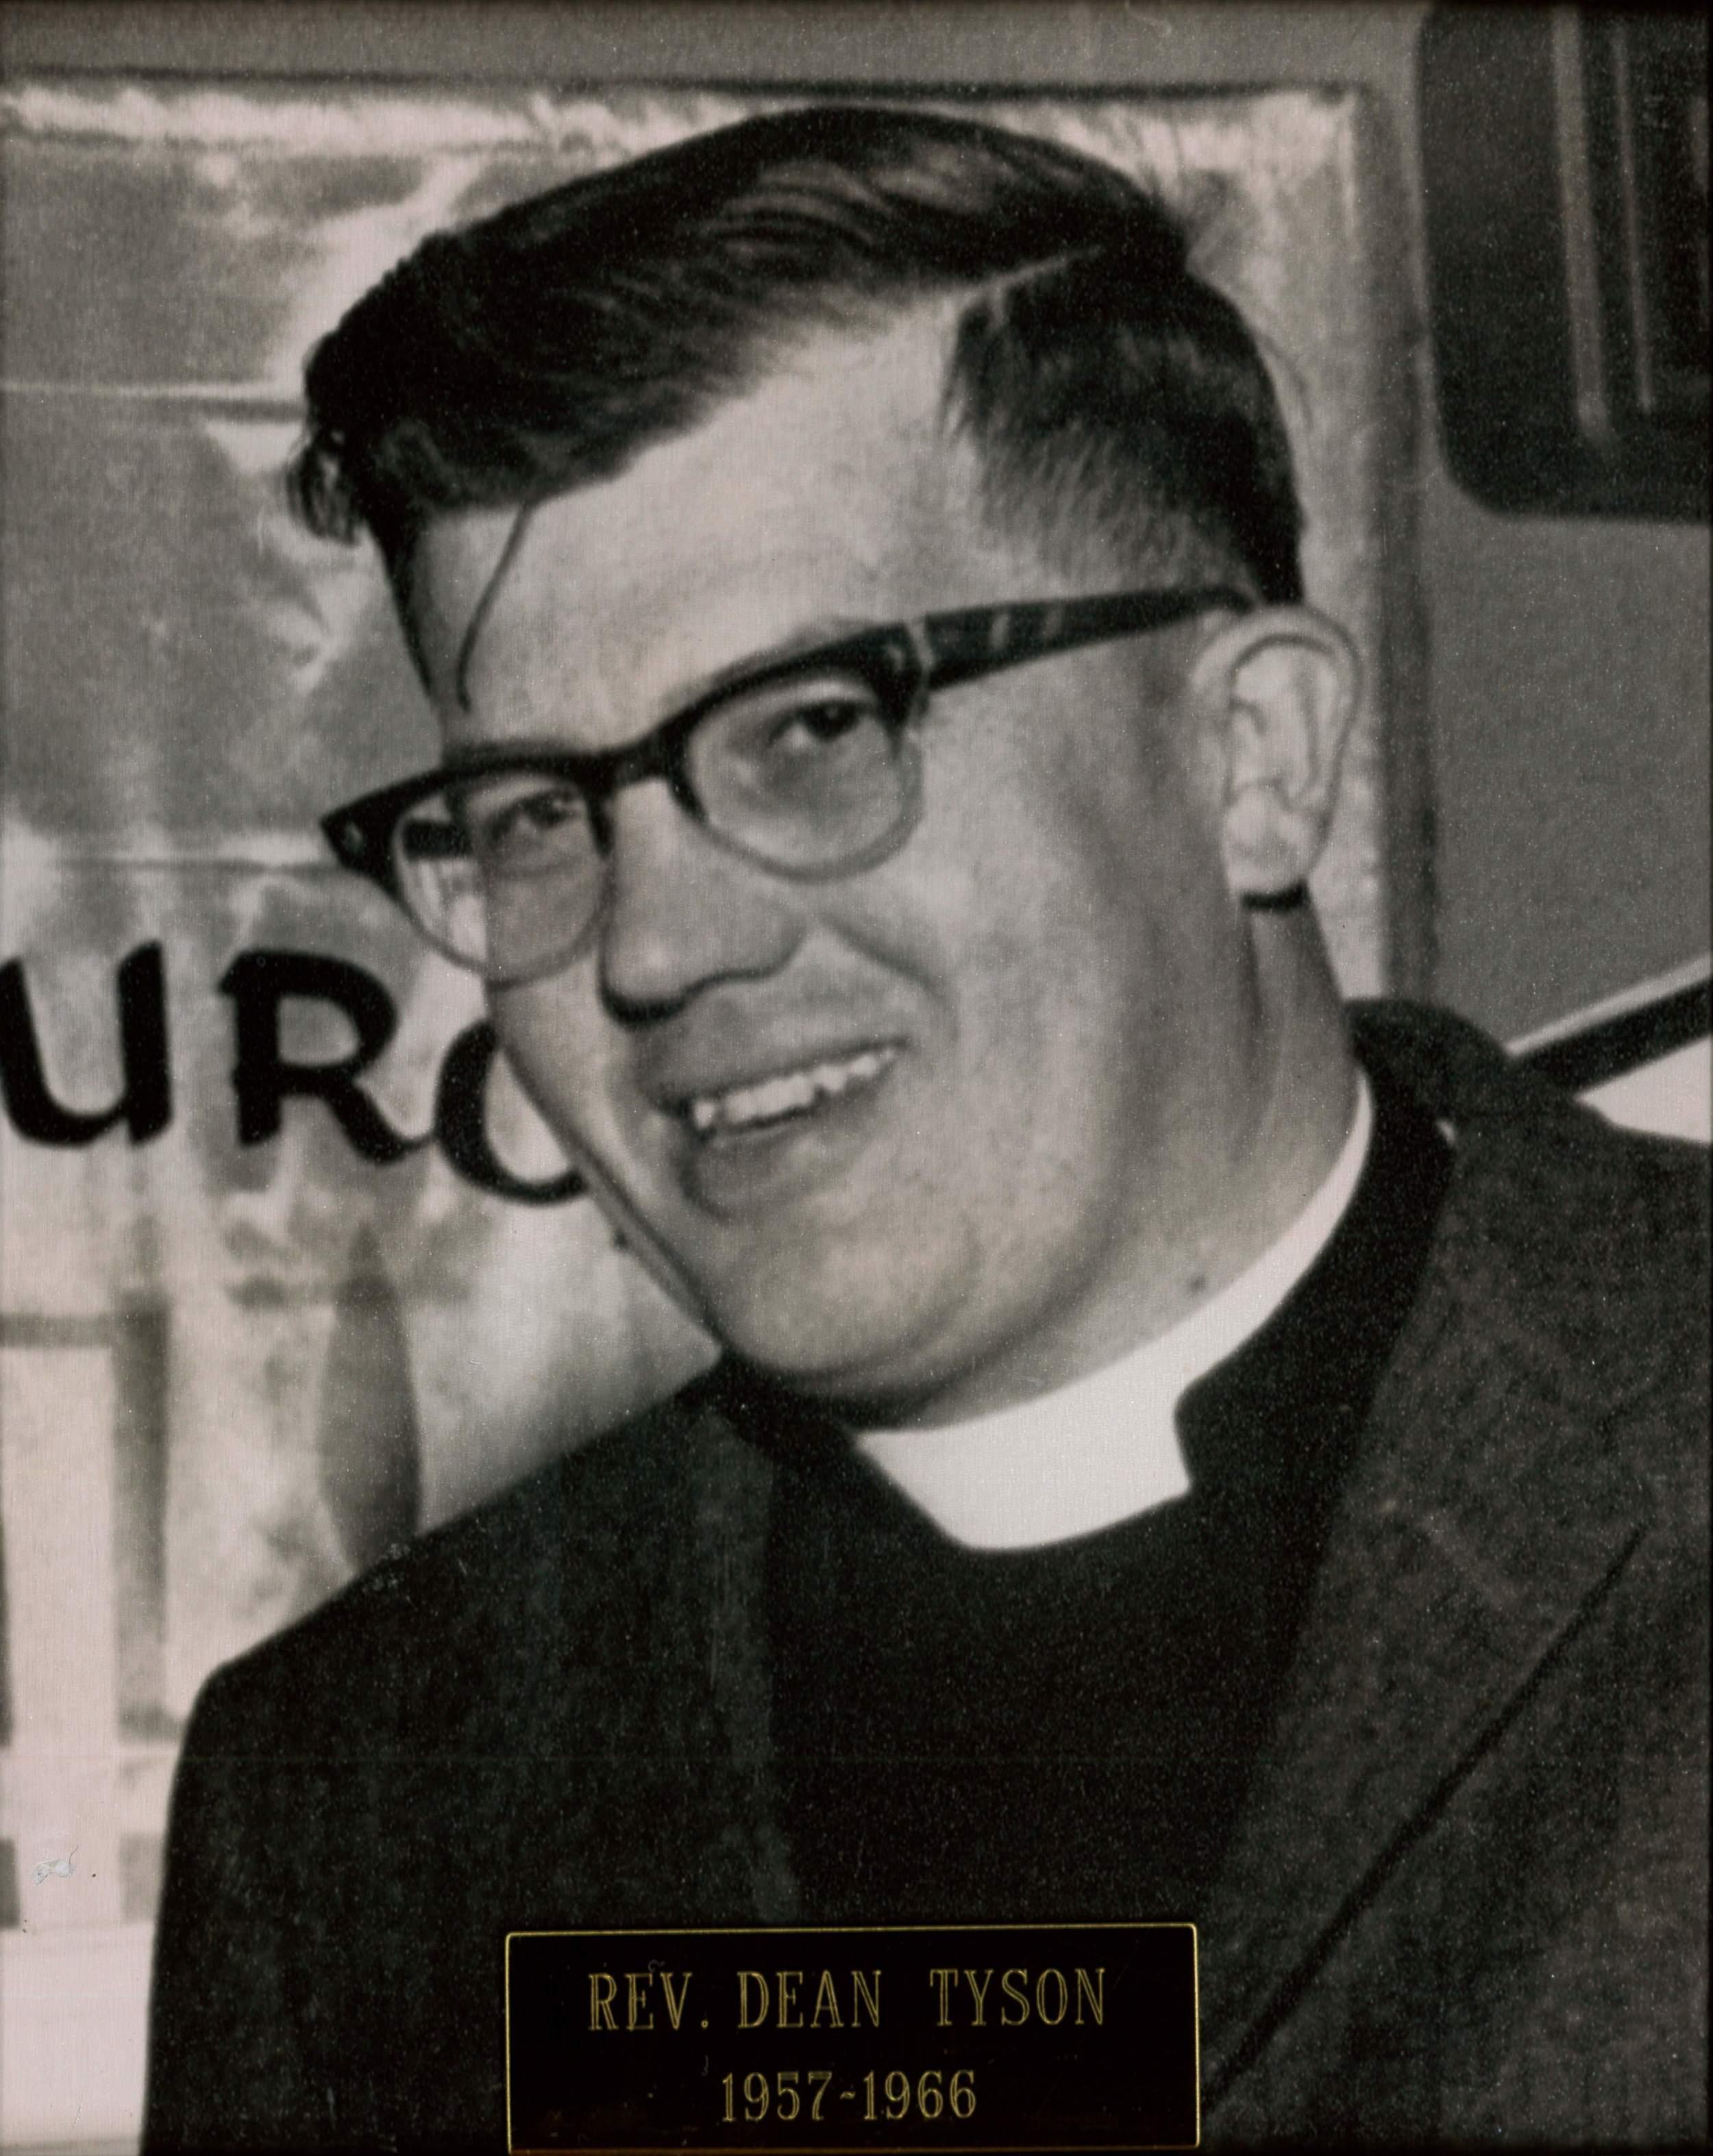 Rev. Dean Tyson